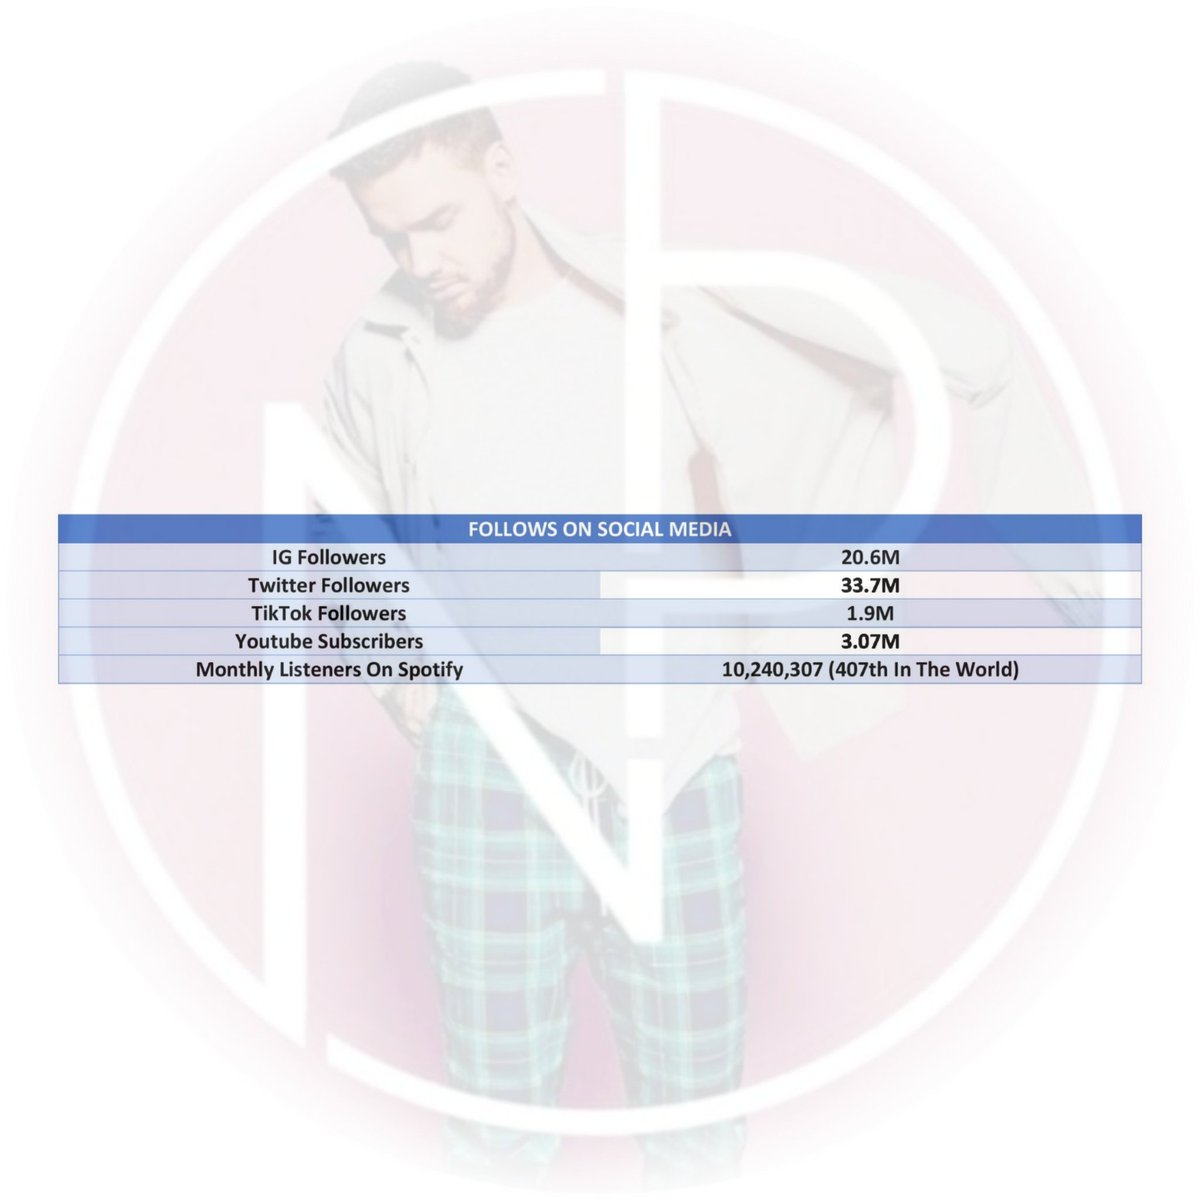 #آپدیتآخرهفته | تعداد دنبالکنندههای لیام در برنامههای مختلف تا یکشنبه ۹ اوت / ۱۹ مرداد! #WeekendUpdate | @LiamPayne's followers on social media till August 9, 2020. pic.twitter.com/eeWgClsK6B